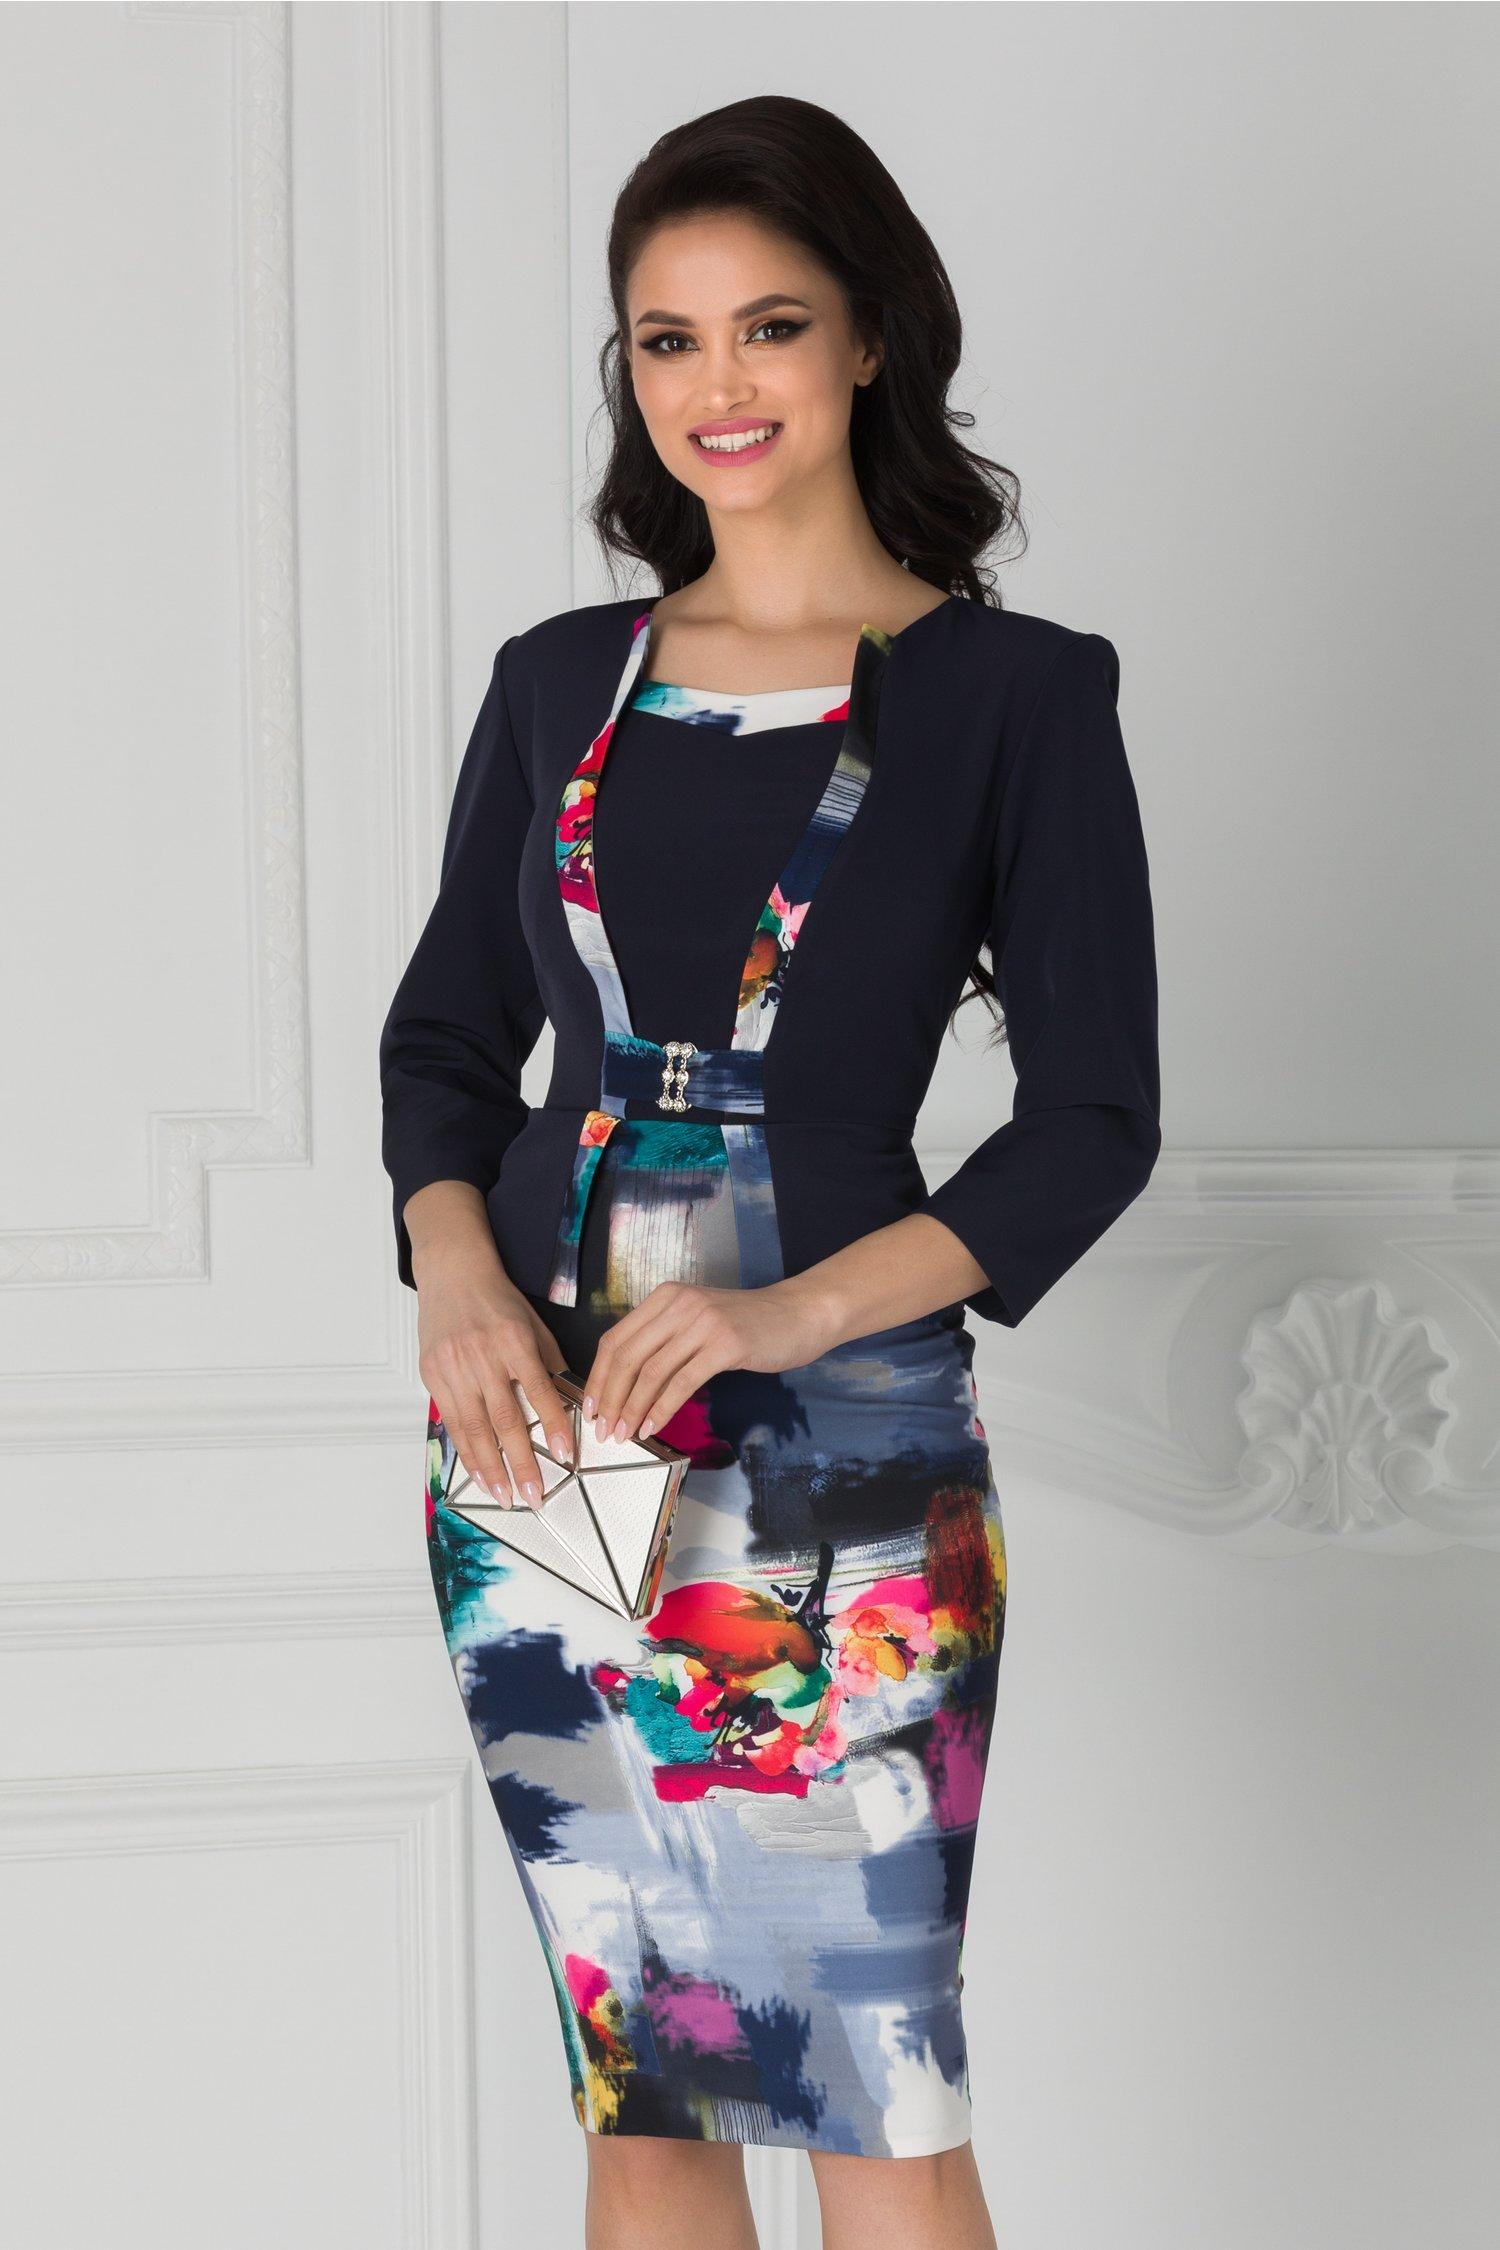 Rochie Bruno bleumarin cu imprimeu multicolor la baza